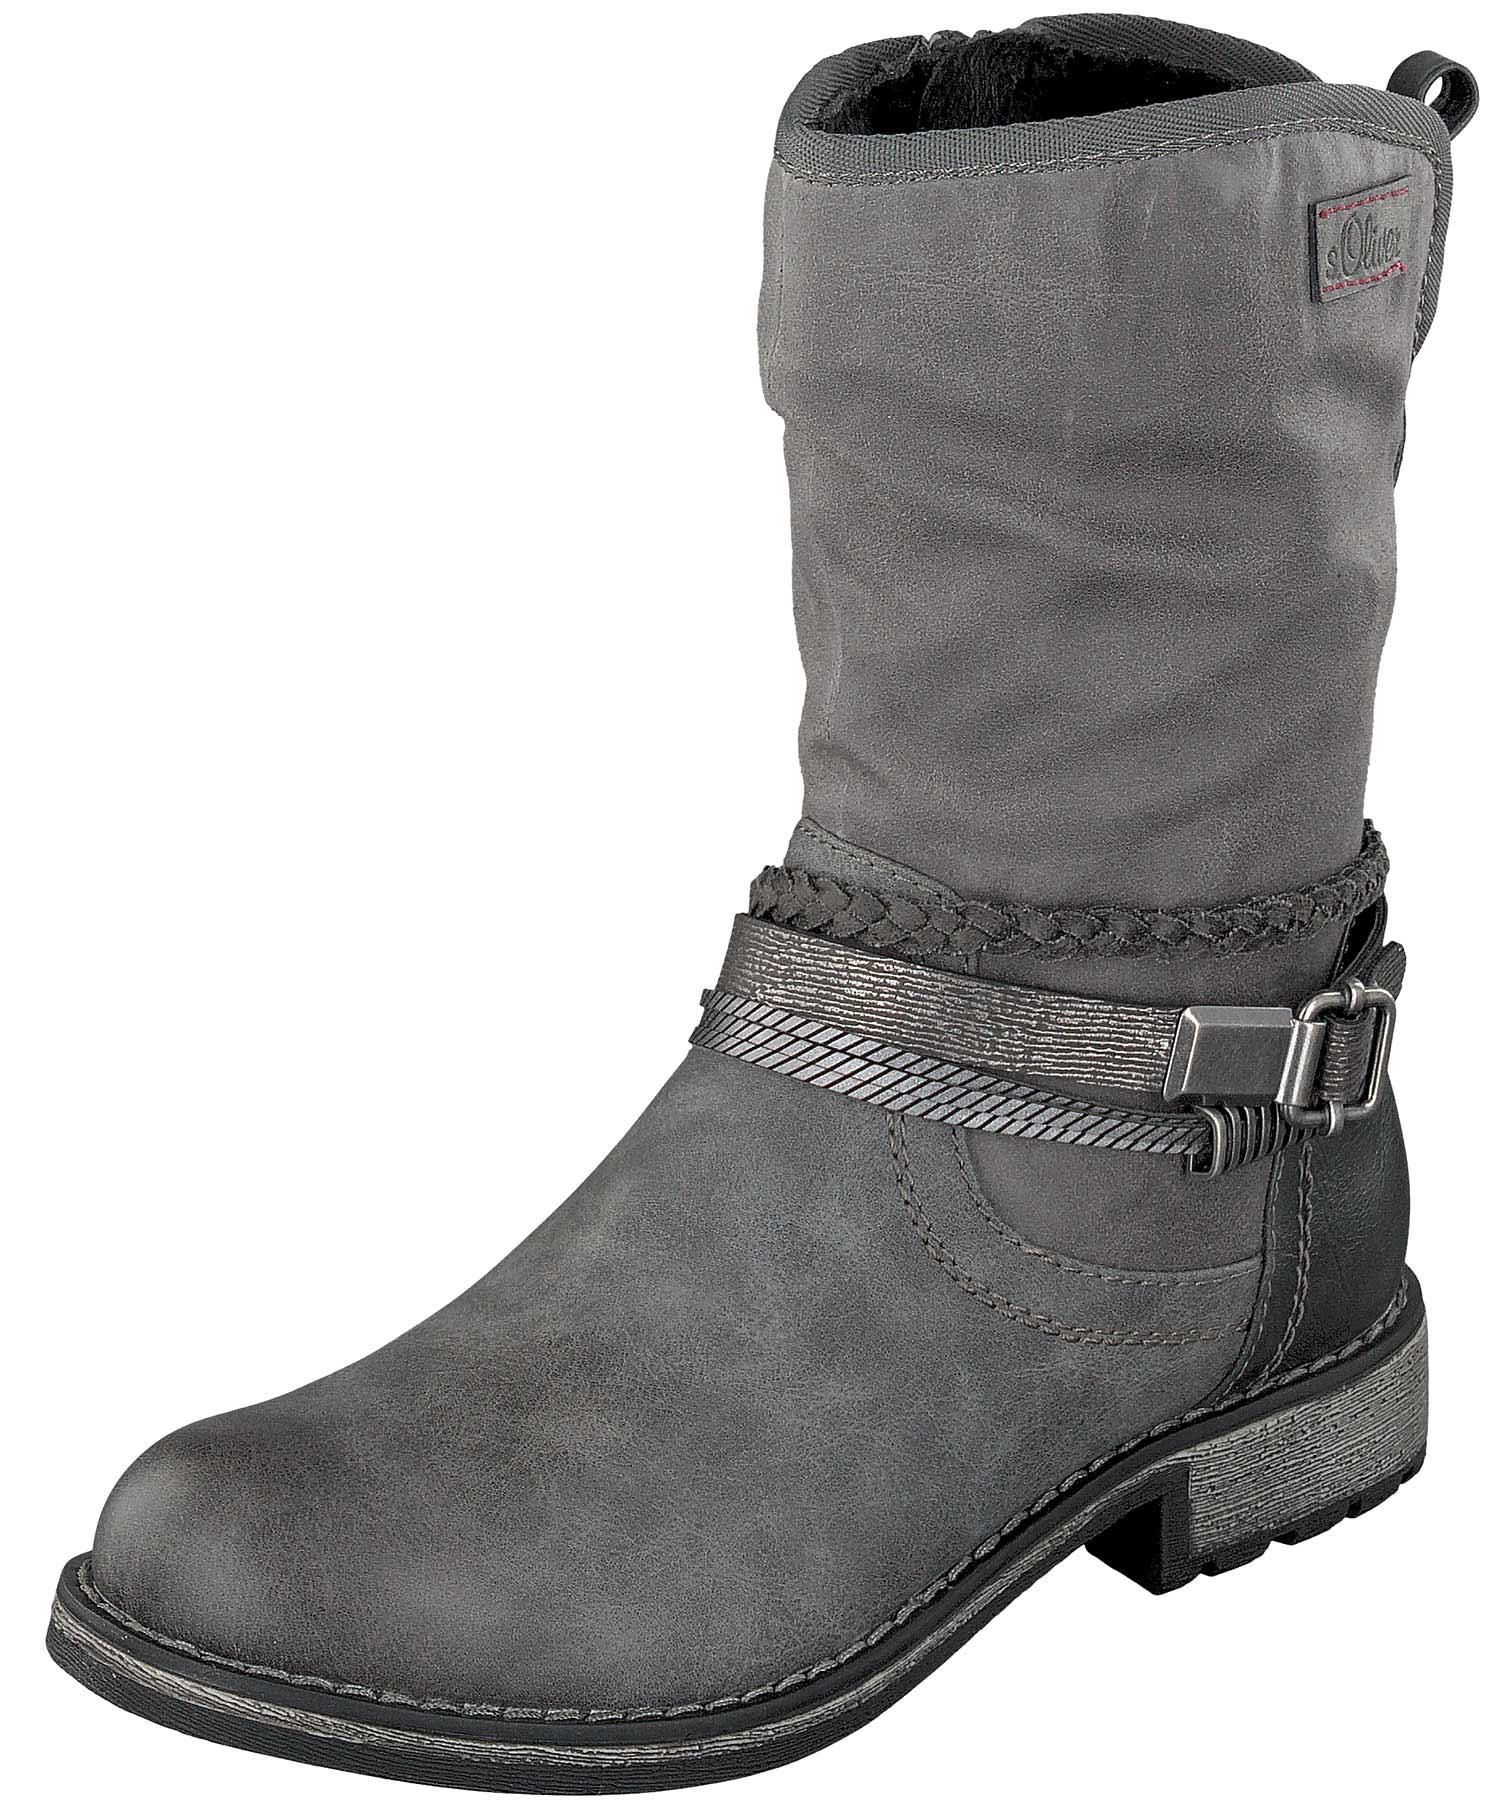 S.oliver Stiefel Stiefeletten Stiefel Damenschuhe 25462-37 216 Grau Neu